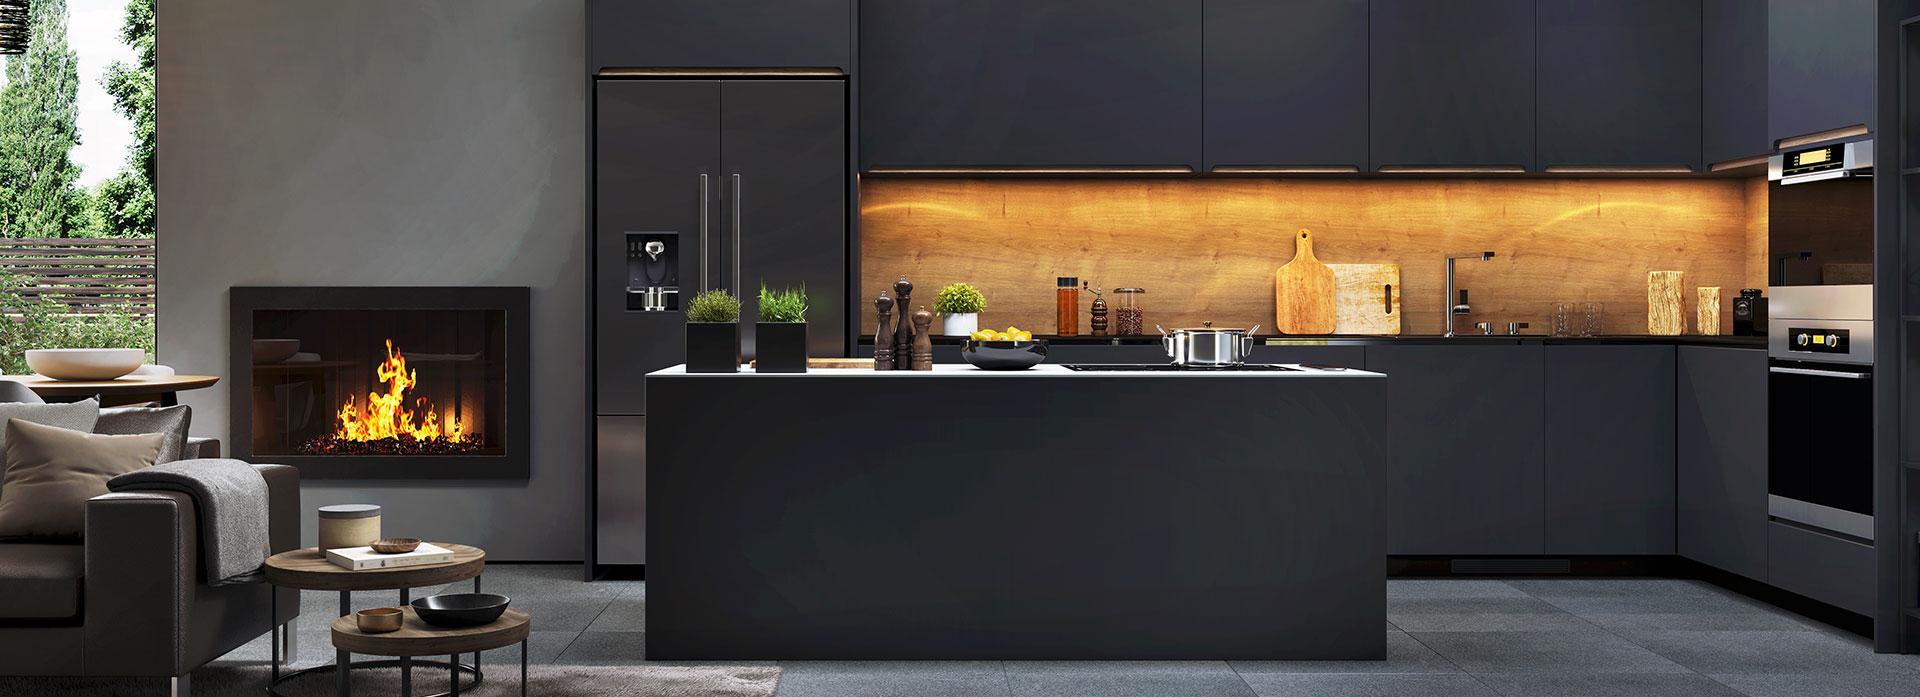 mobili su misura slide cucina home